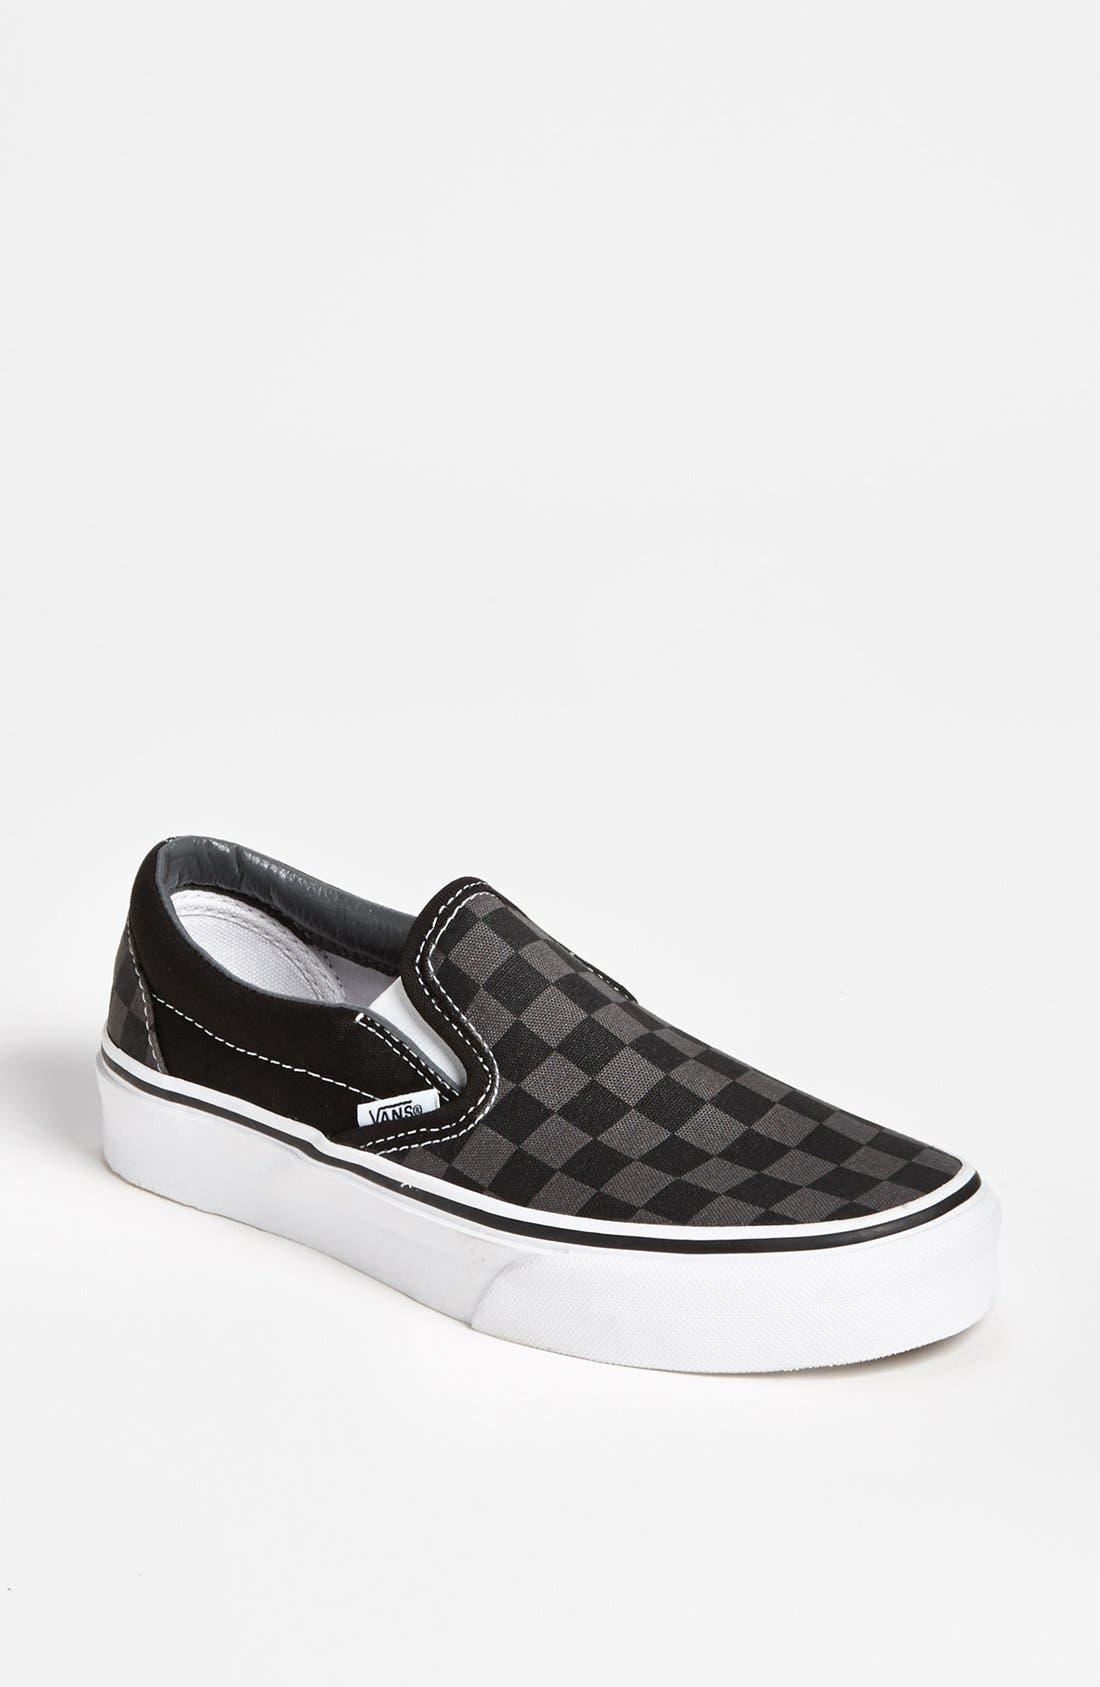 Alternate Image 1 Selected - Vans 'Classic - Checker' Sneaker (Women)